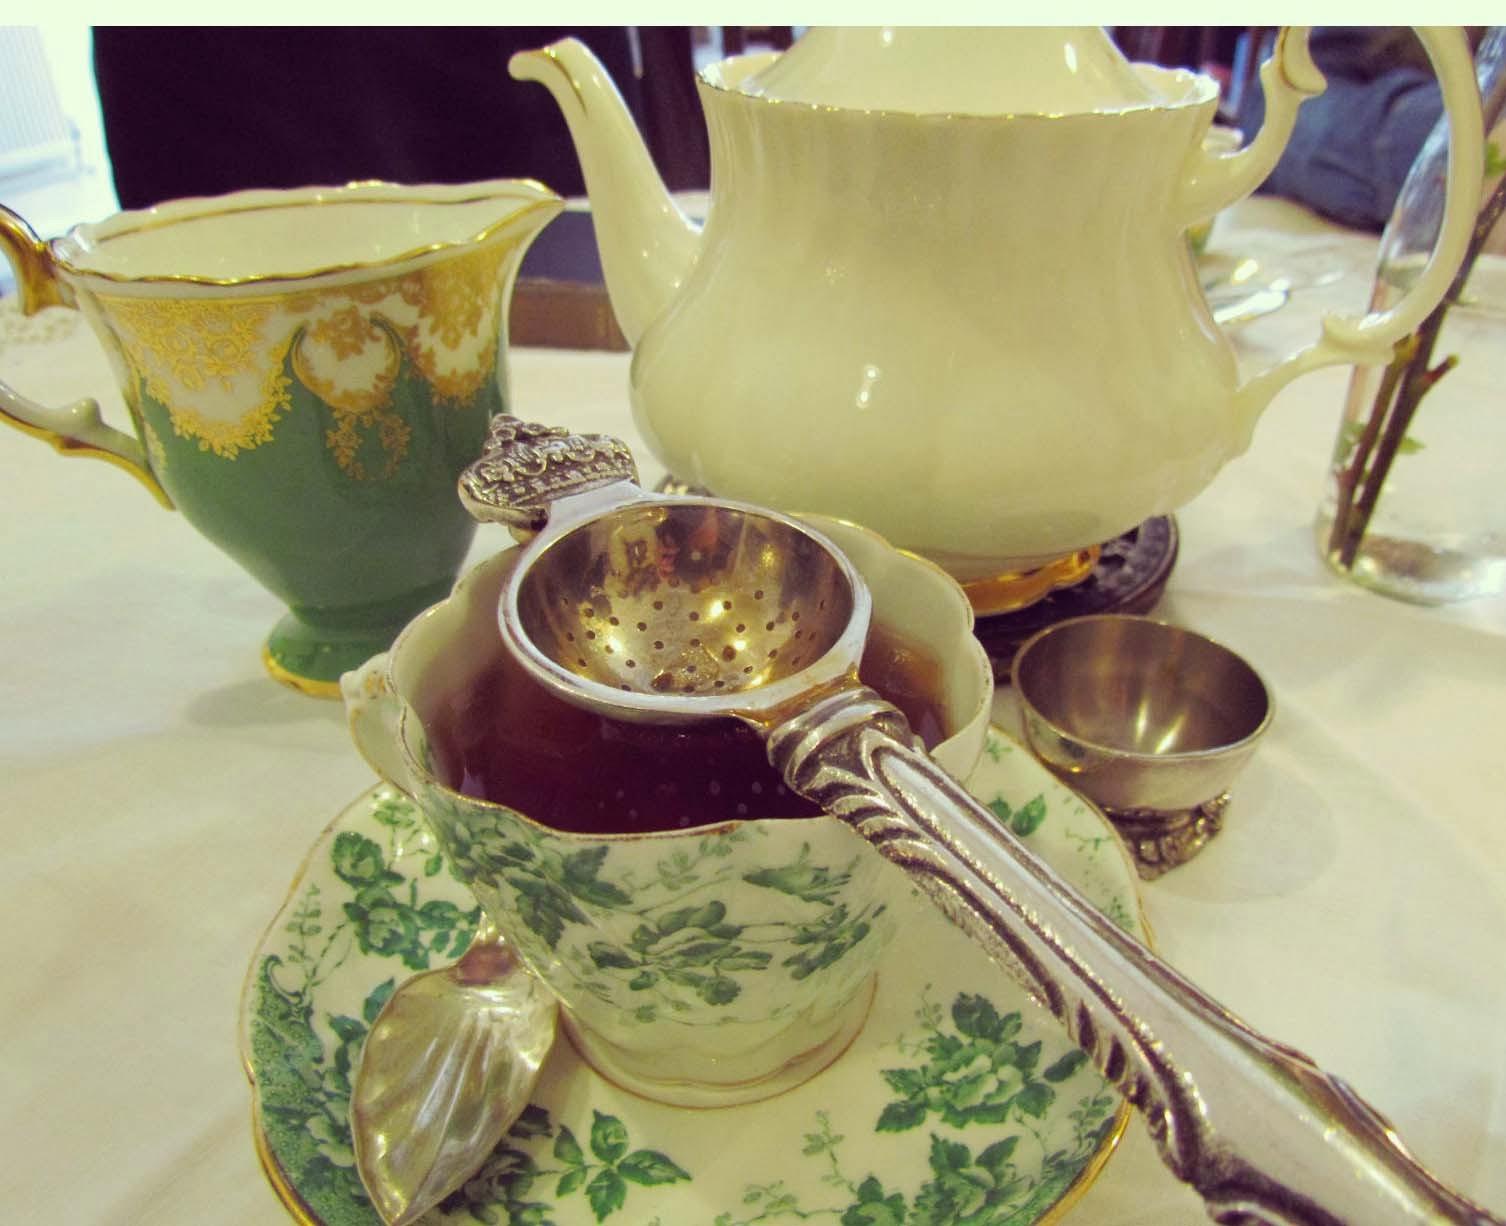 Totteridge and Whetstone, London, places to eat, treat, afternoon tea,  52 Totteridge Ln, London N20 9QJ, cafe, cup of tea, lovely, treat, great food, vintage, furniture,  quaint, teashop, The Waiting Room,